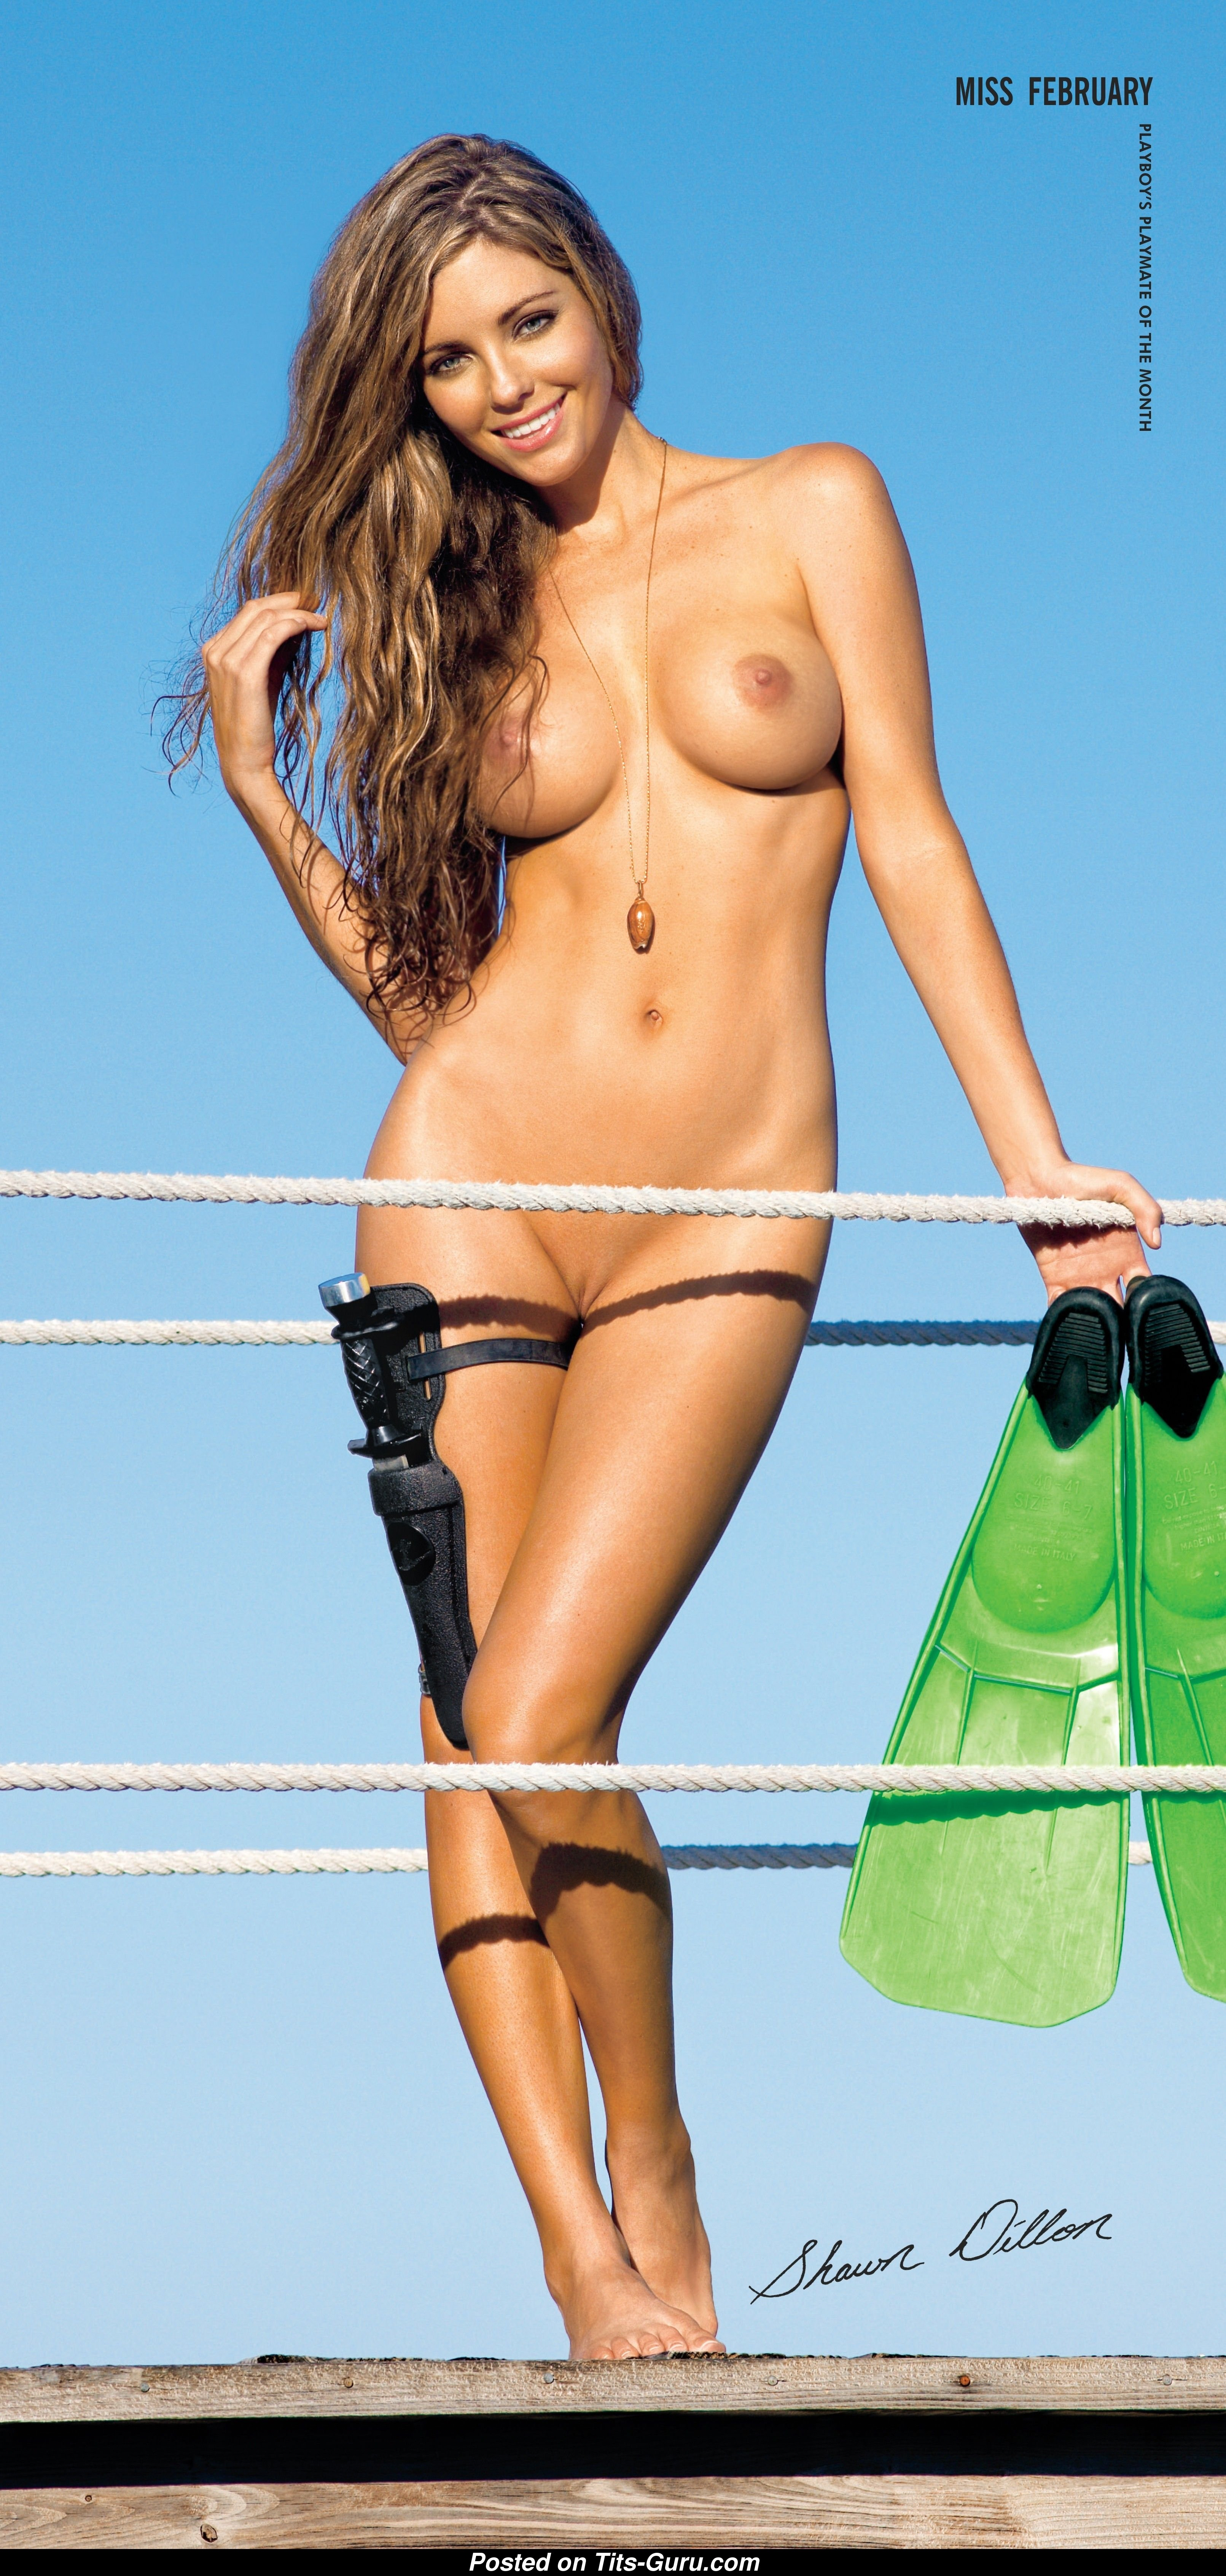 shawn dillon nude